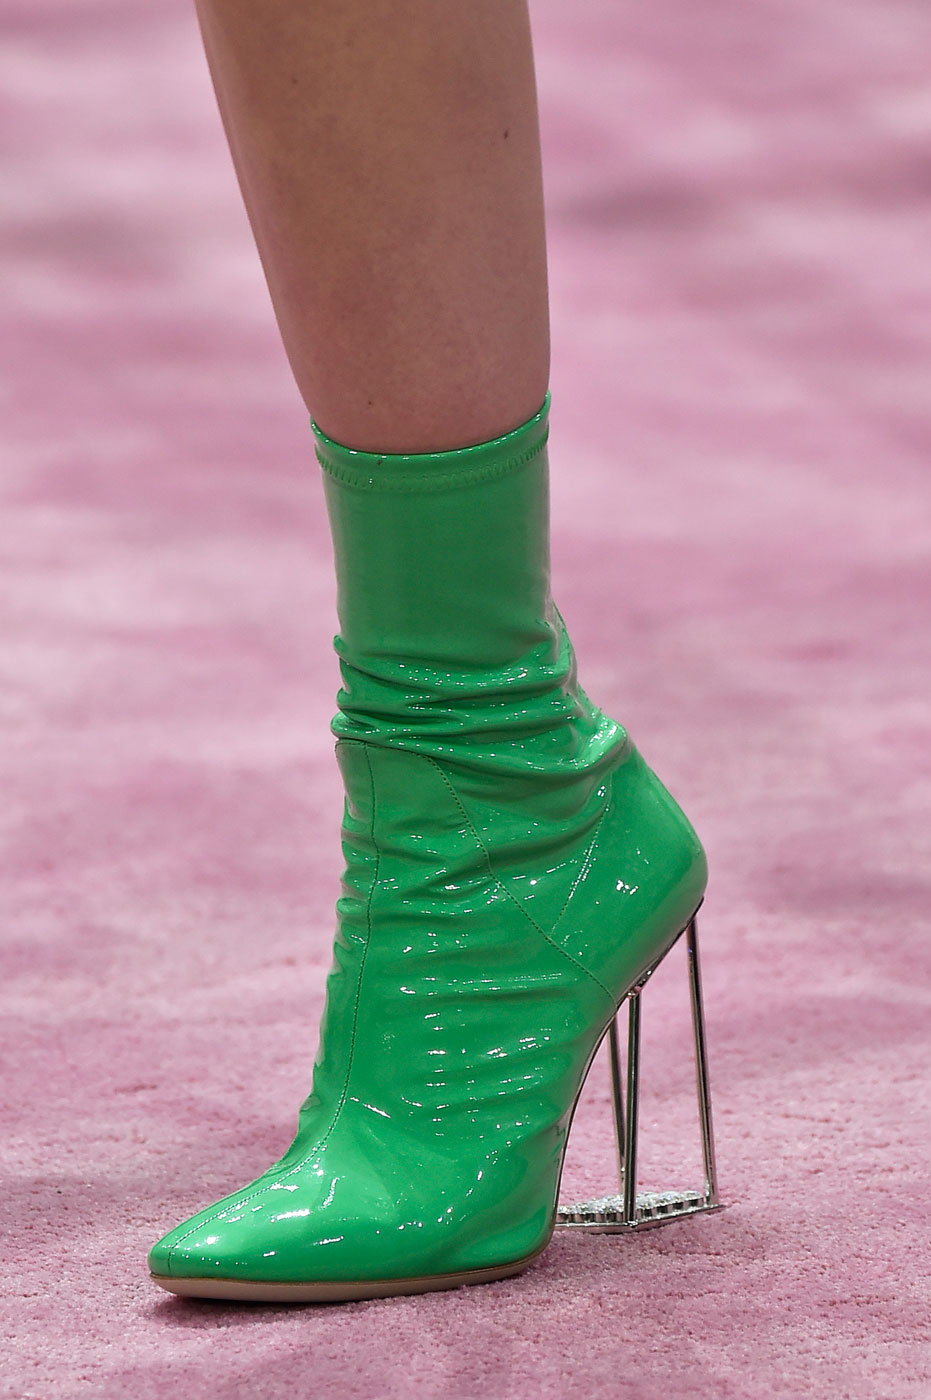 Christian-Dior-fashion-runway-show-close-ups-haute-couture-paris-spring-summer-2015-the-impression-160